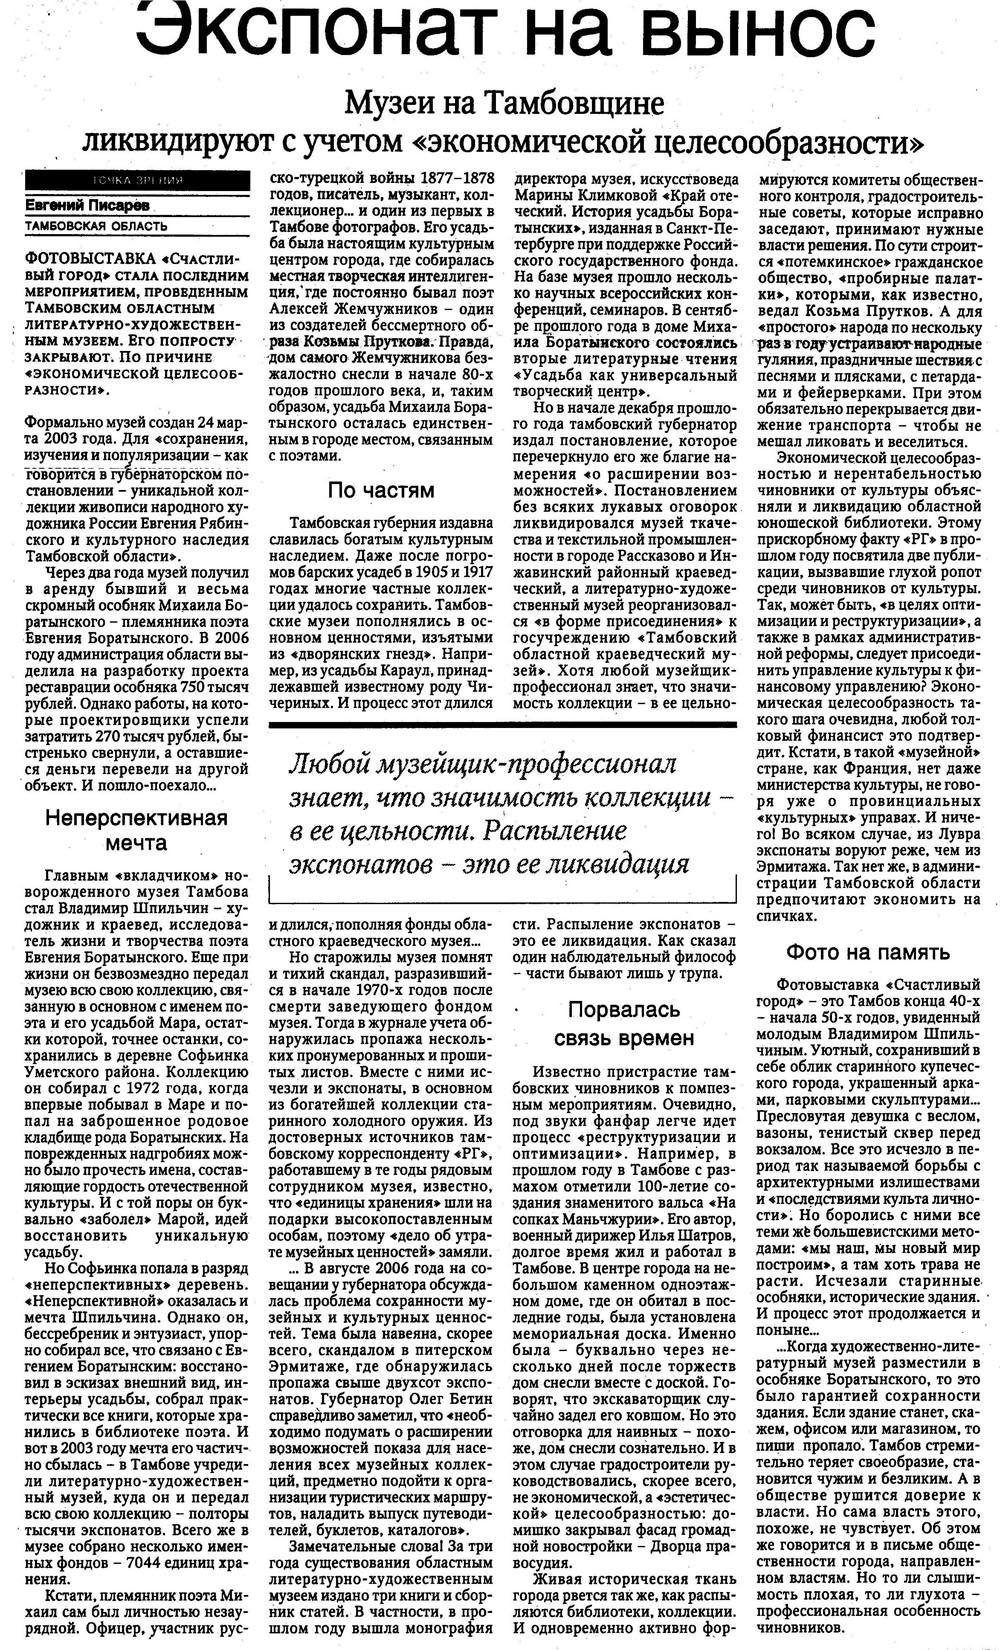 Статья Е. Писарева в